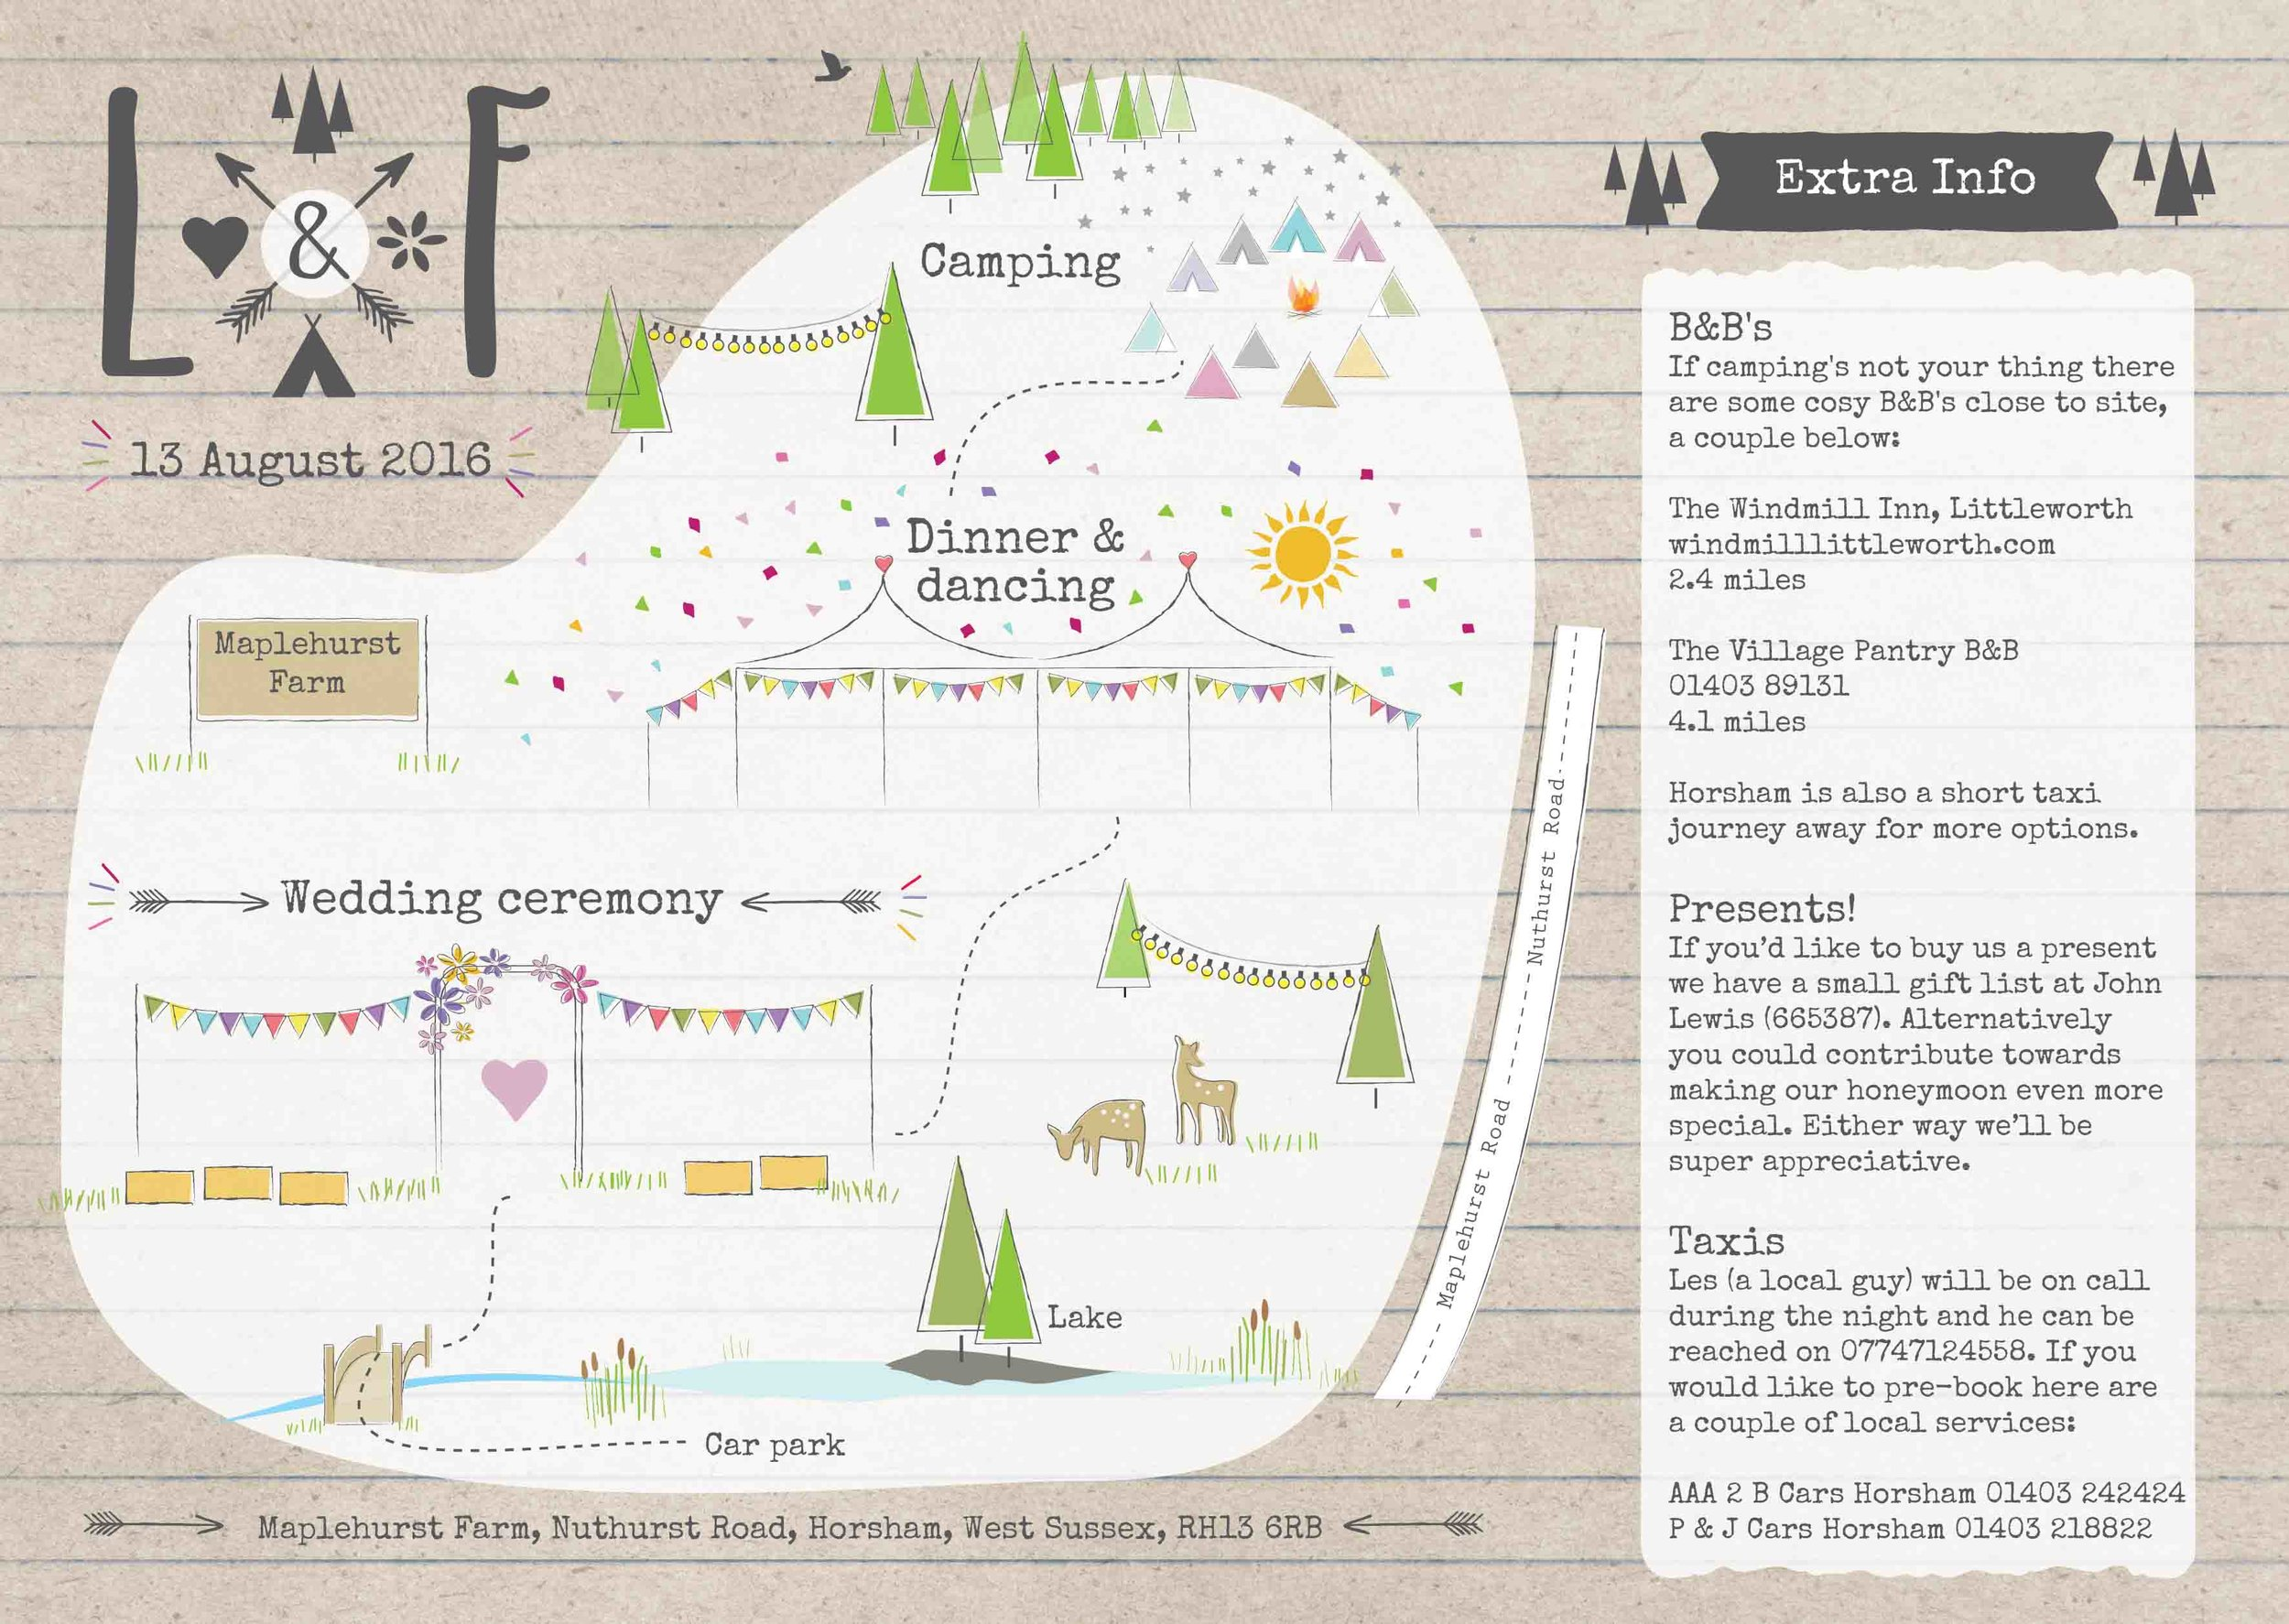 Bespoke illustrated map for invite